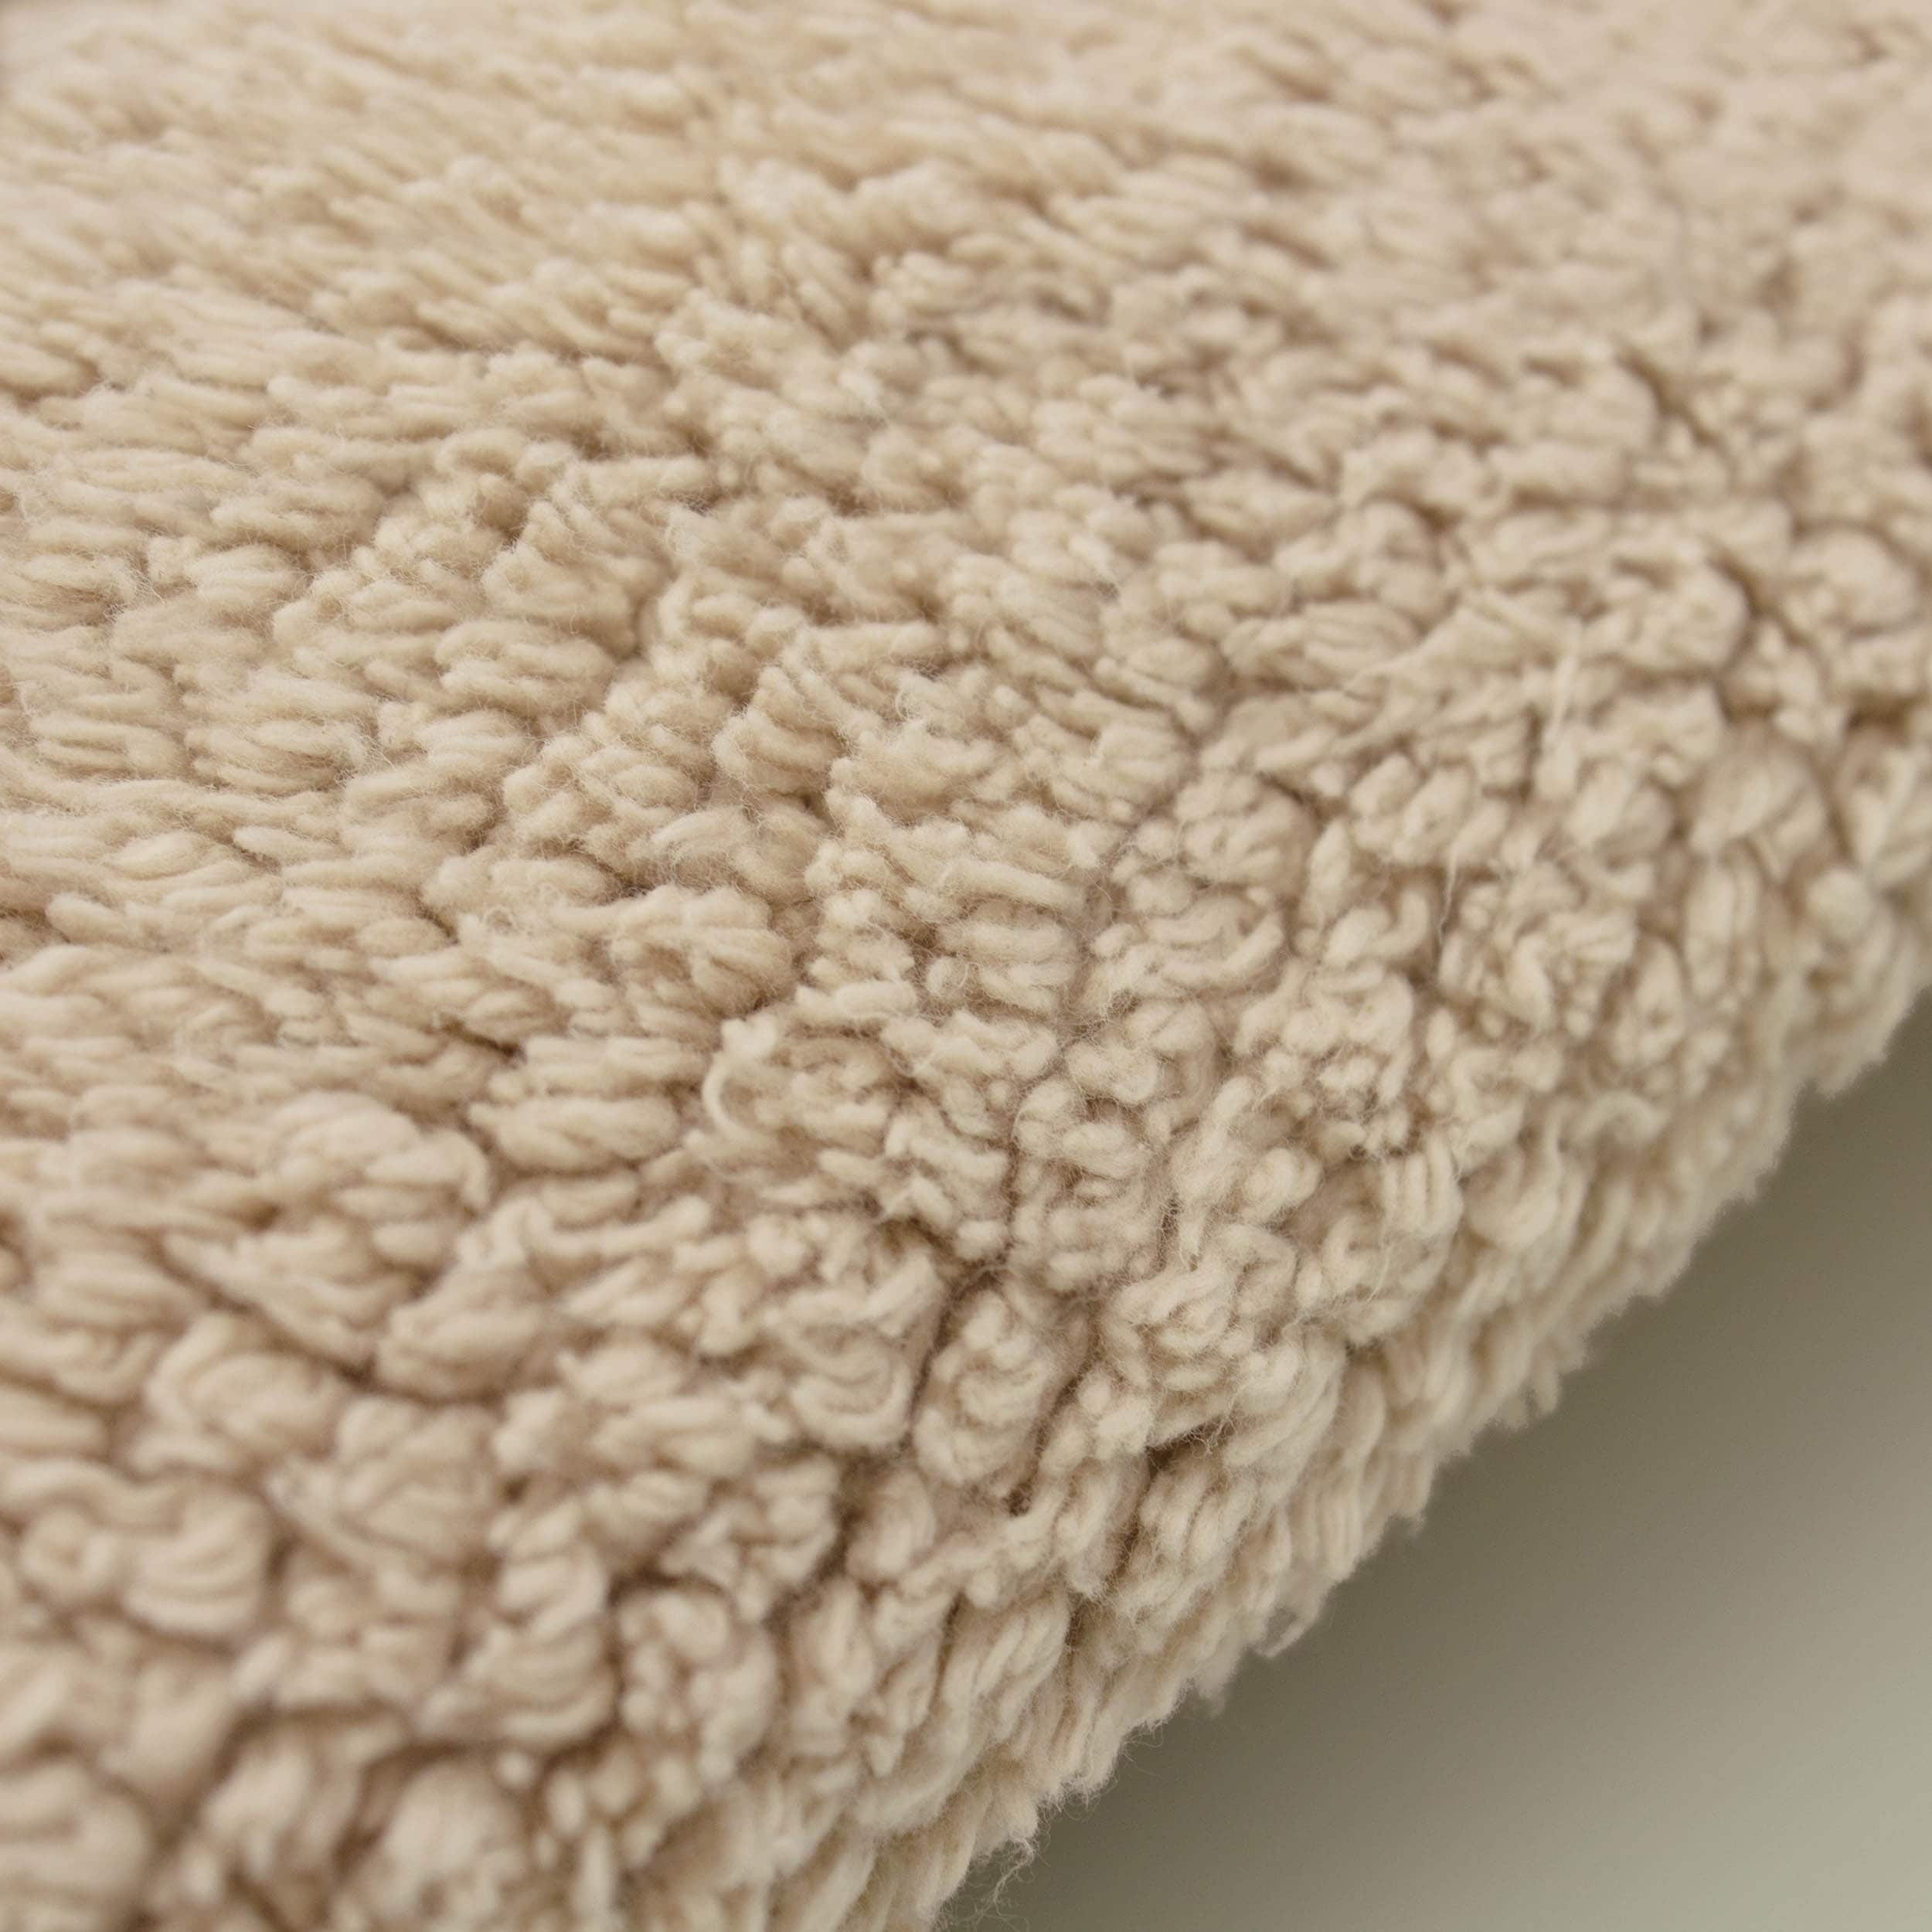 Laura Ashley Reversible Cotton Crochet 21 X 34 In. Bath